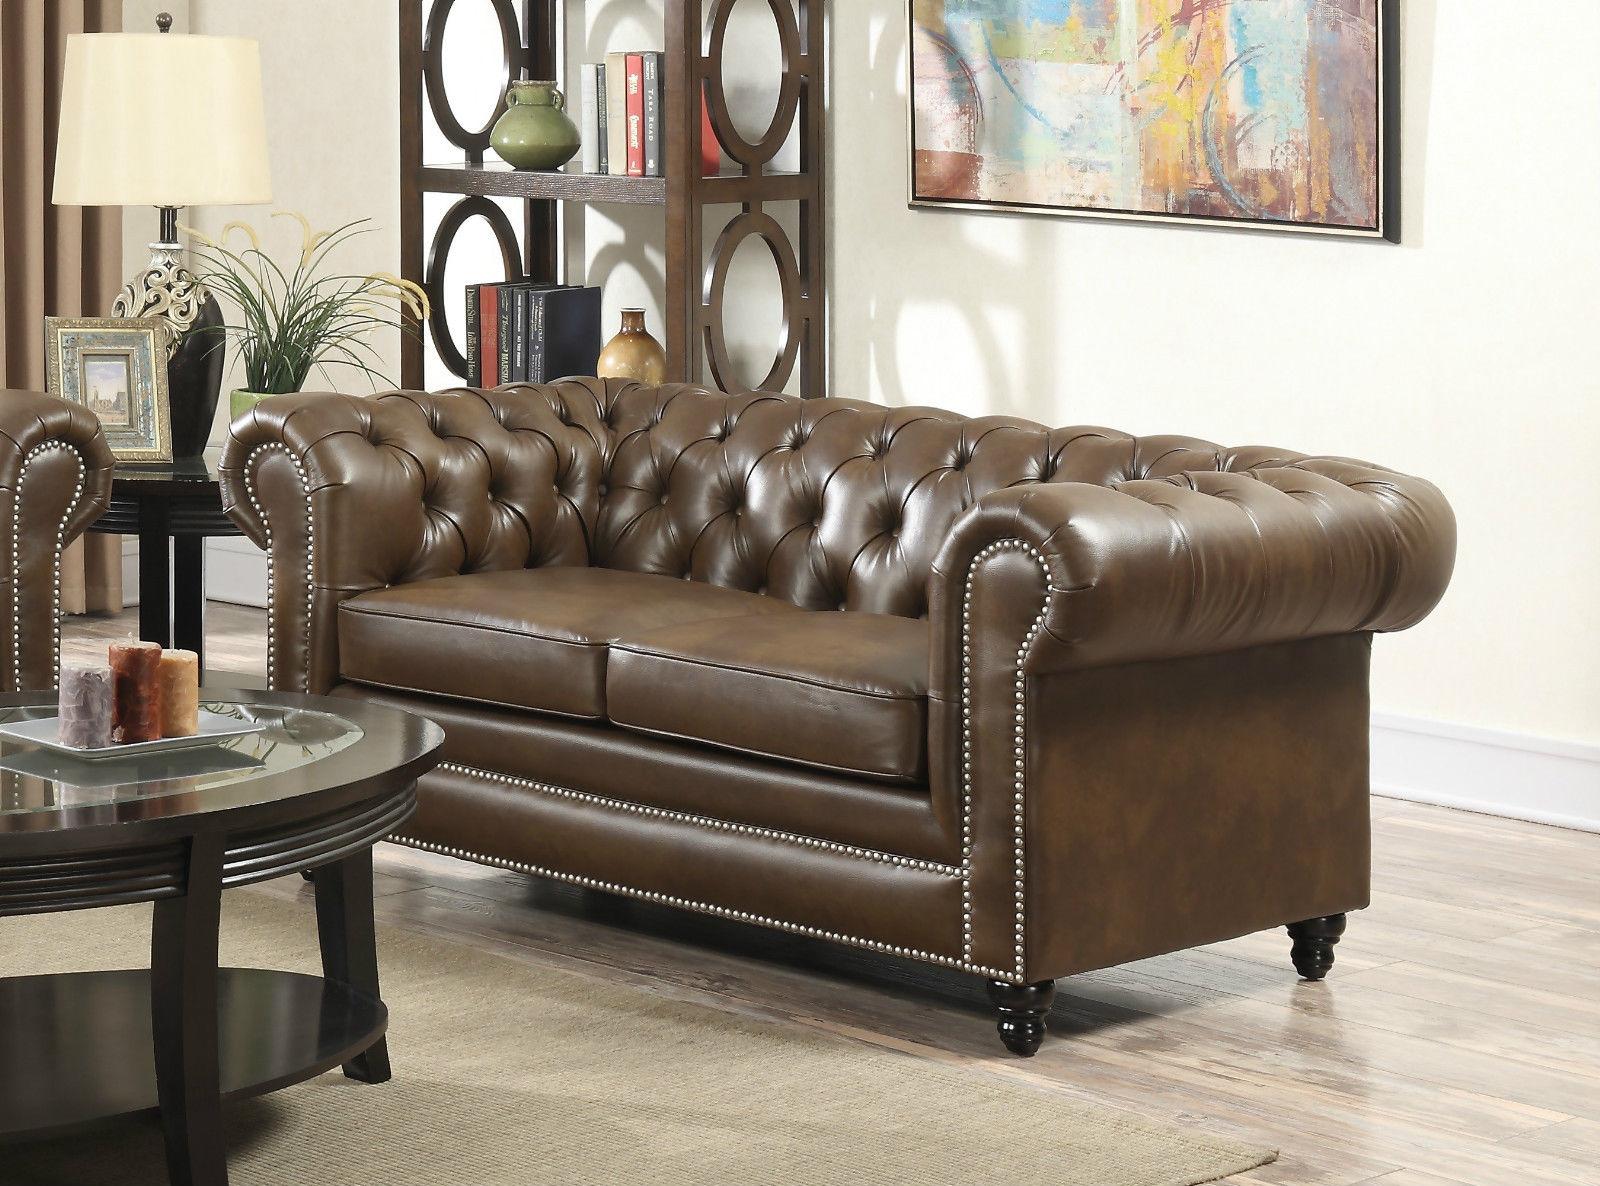 chesterfield sofas und ledersofas slsofa8 designersofa. Black Bedroom Furniture Sets. Home Design Ideas